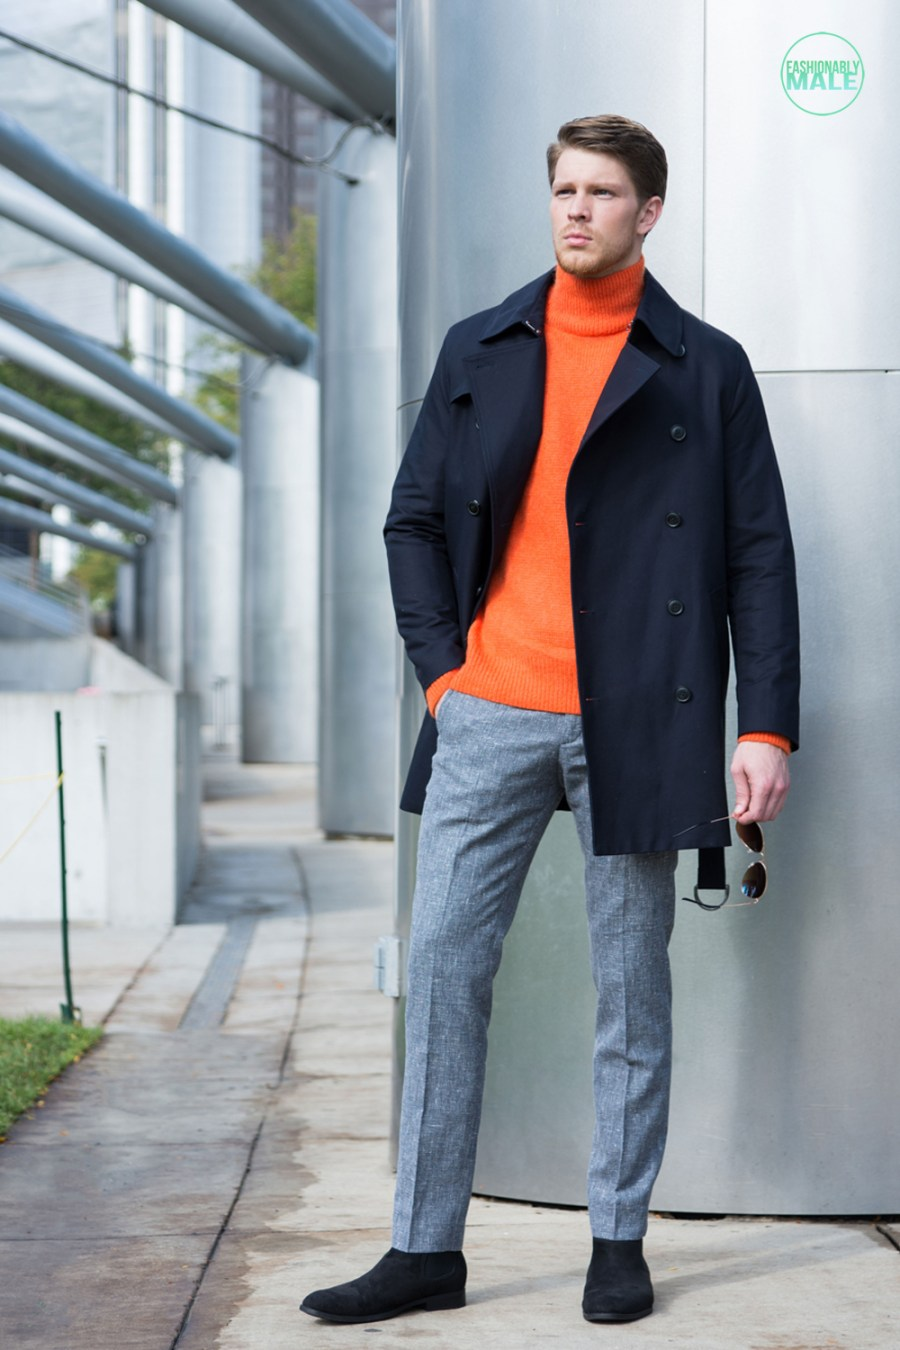 Matthew Mason for Fashionably Male (4)